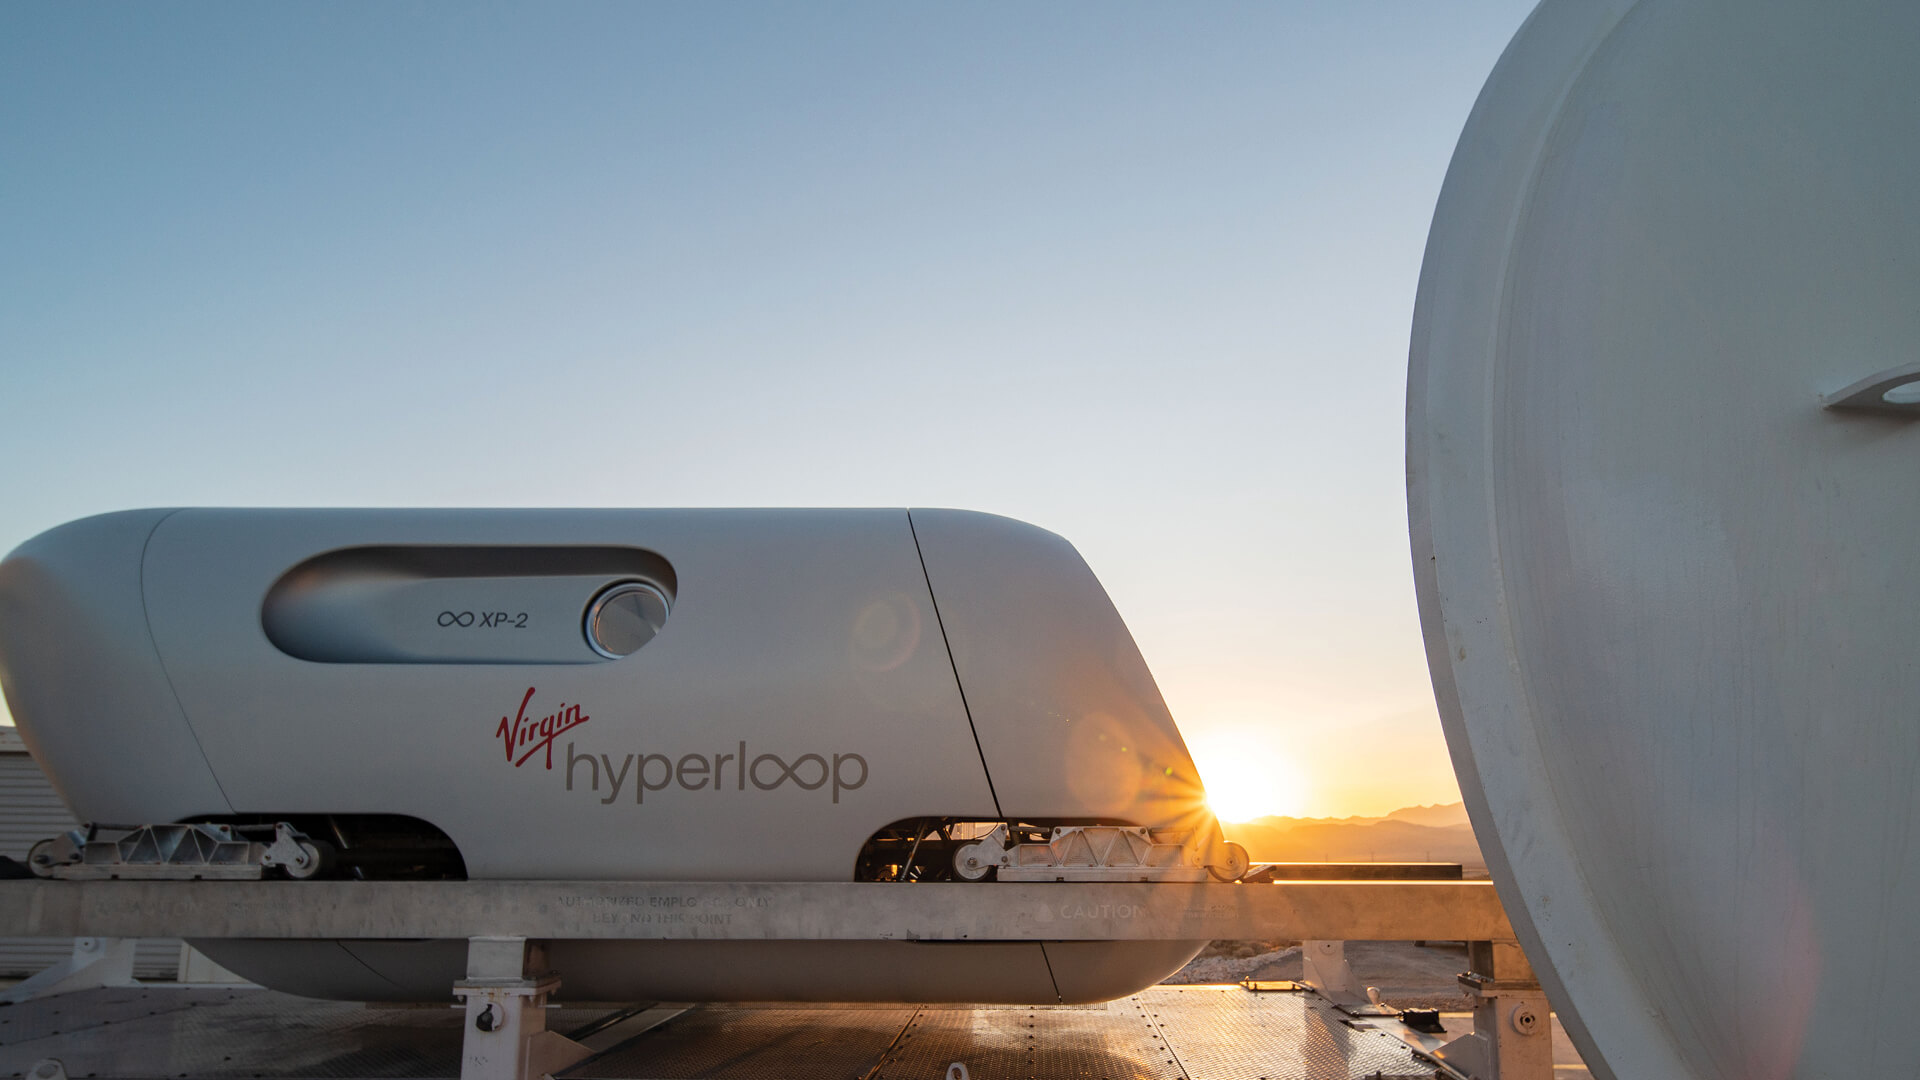 BIG-designed Virgin Hyperloop pod 'Pegasus' completes first manned test run